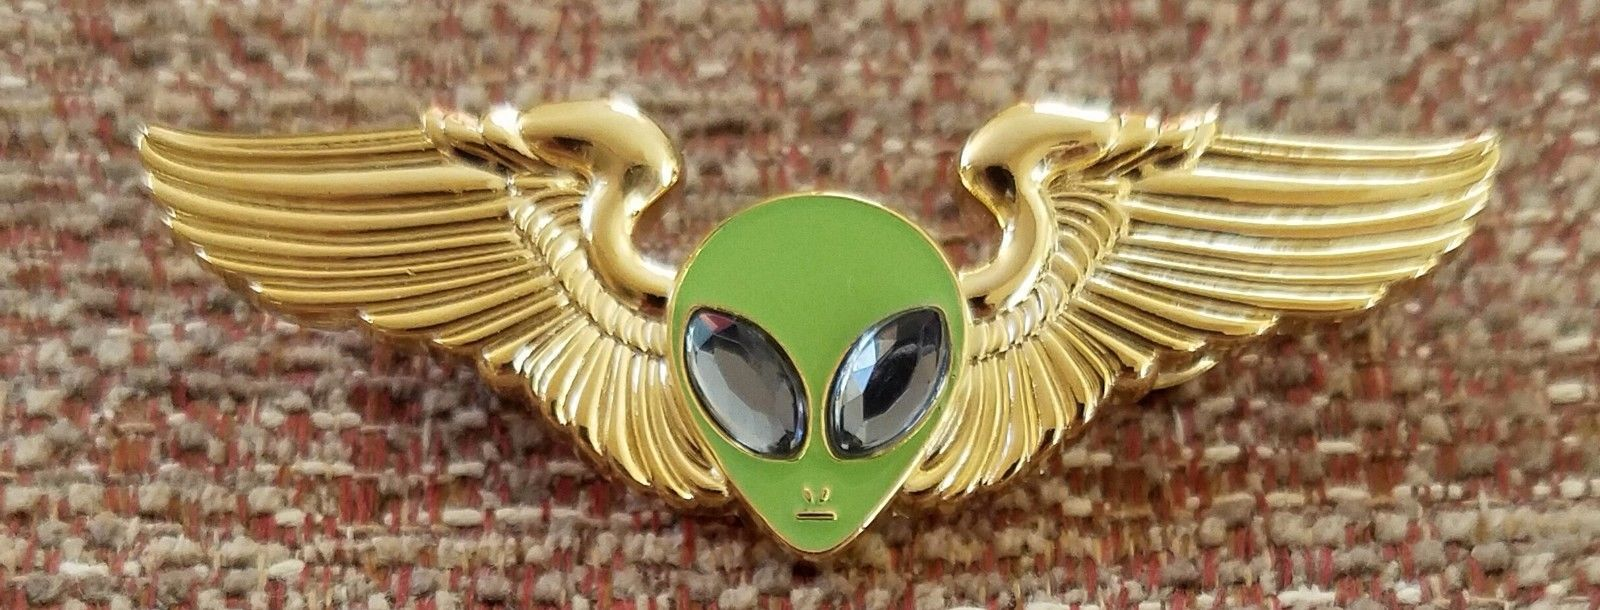 "JANET AIRLINES PILOT WINGS LAPEL PIN ALIEN HEAD /""GLOW IN THE DARK/"""